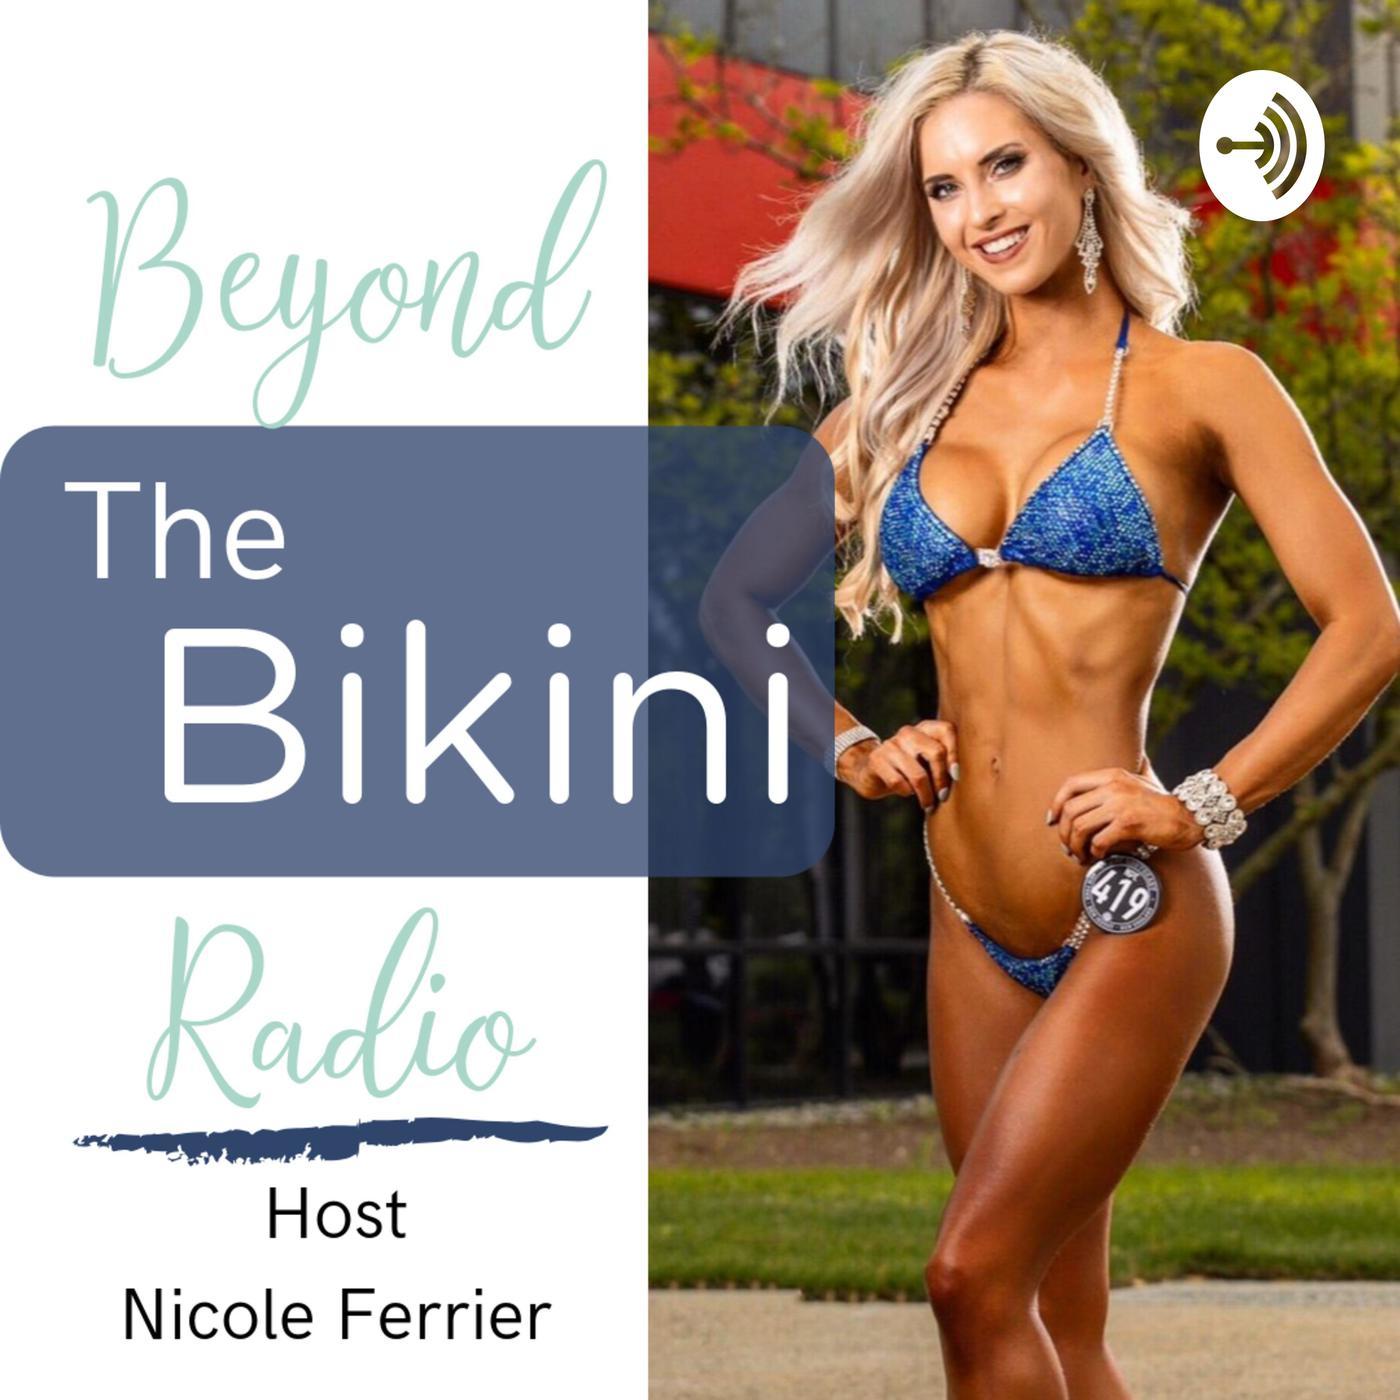 Belinda carlisle tits playboy